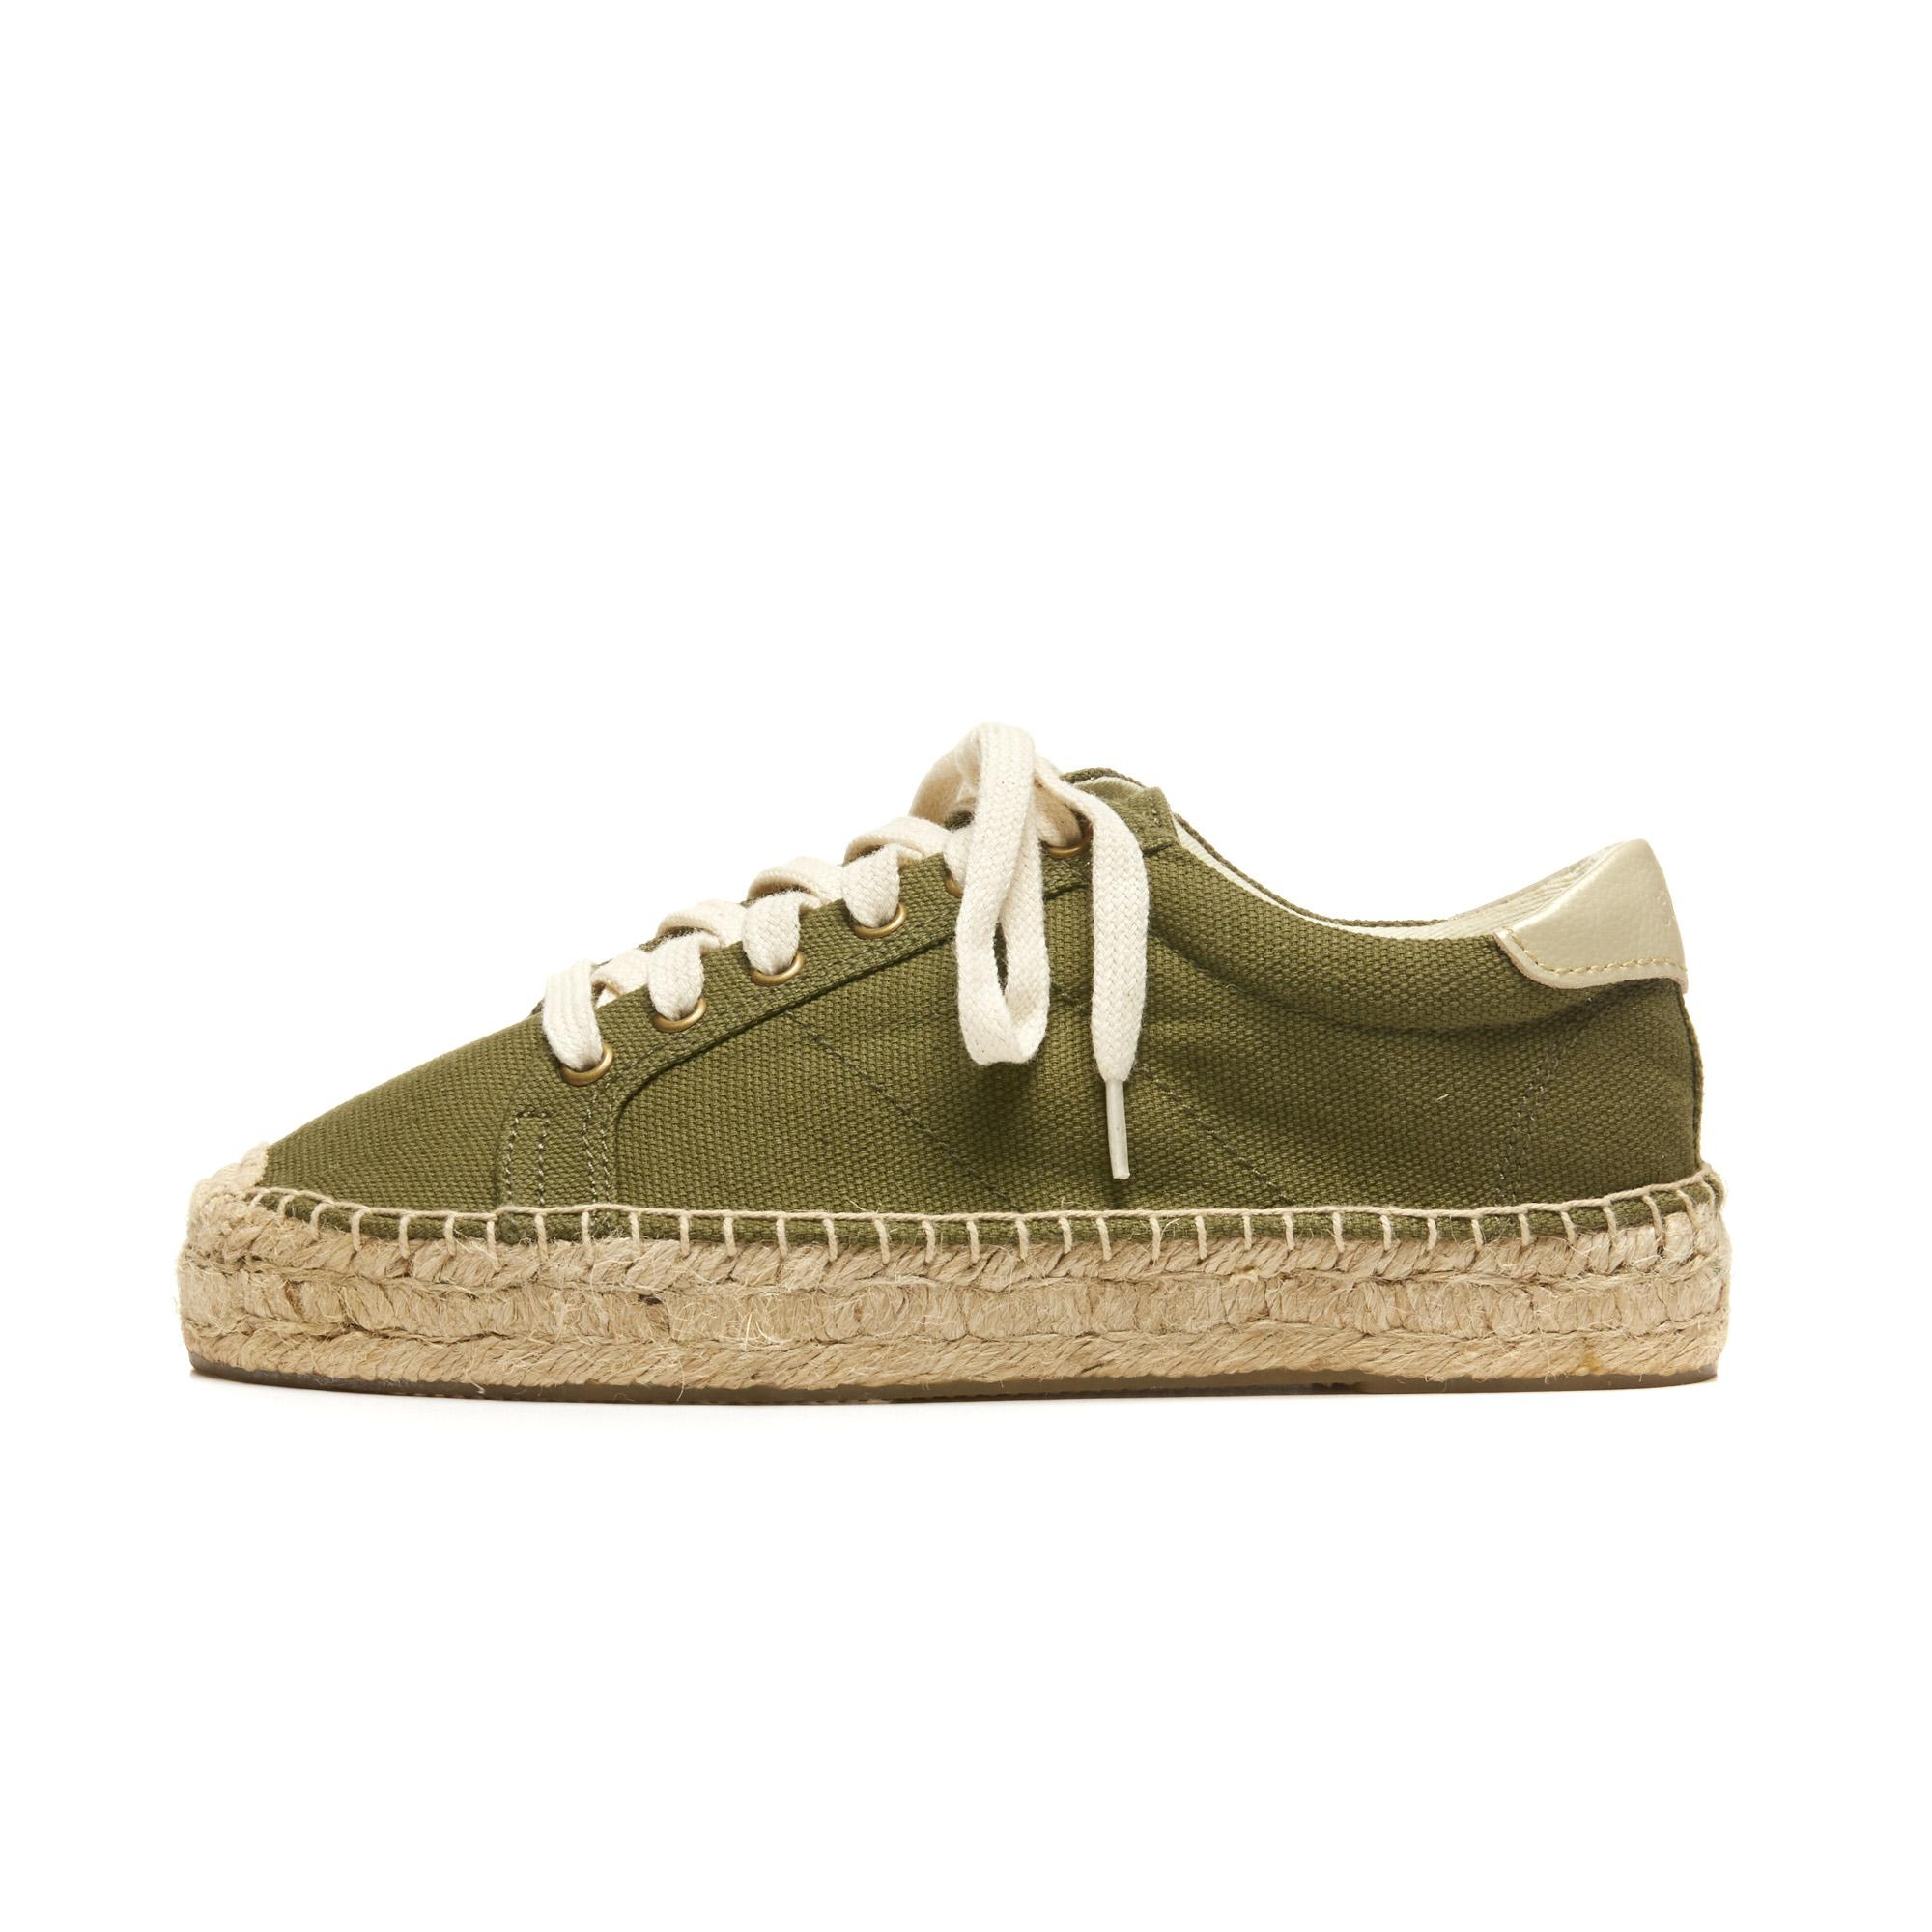 Soludos Canvas Platform Sneaker in Camo Army Green (Green)